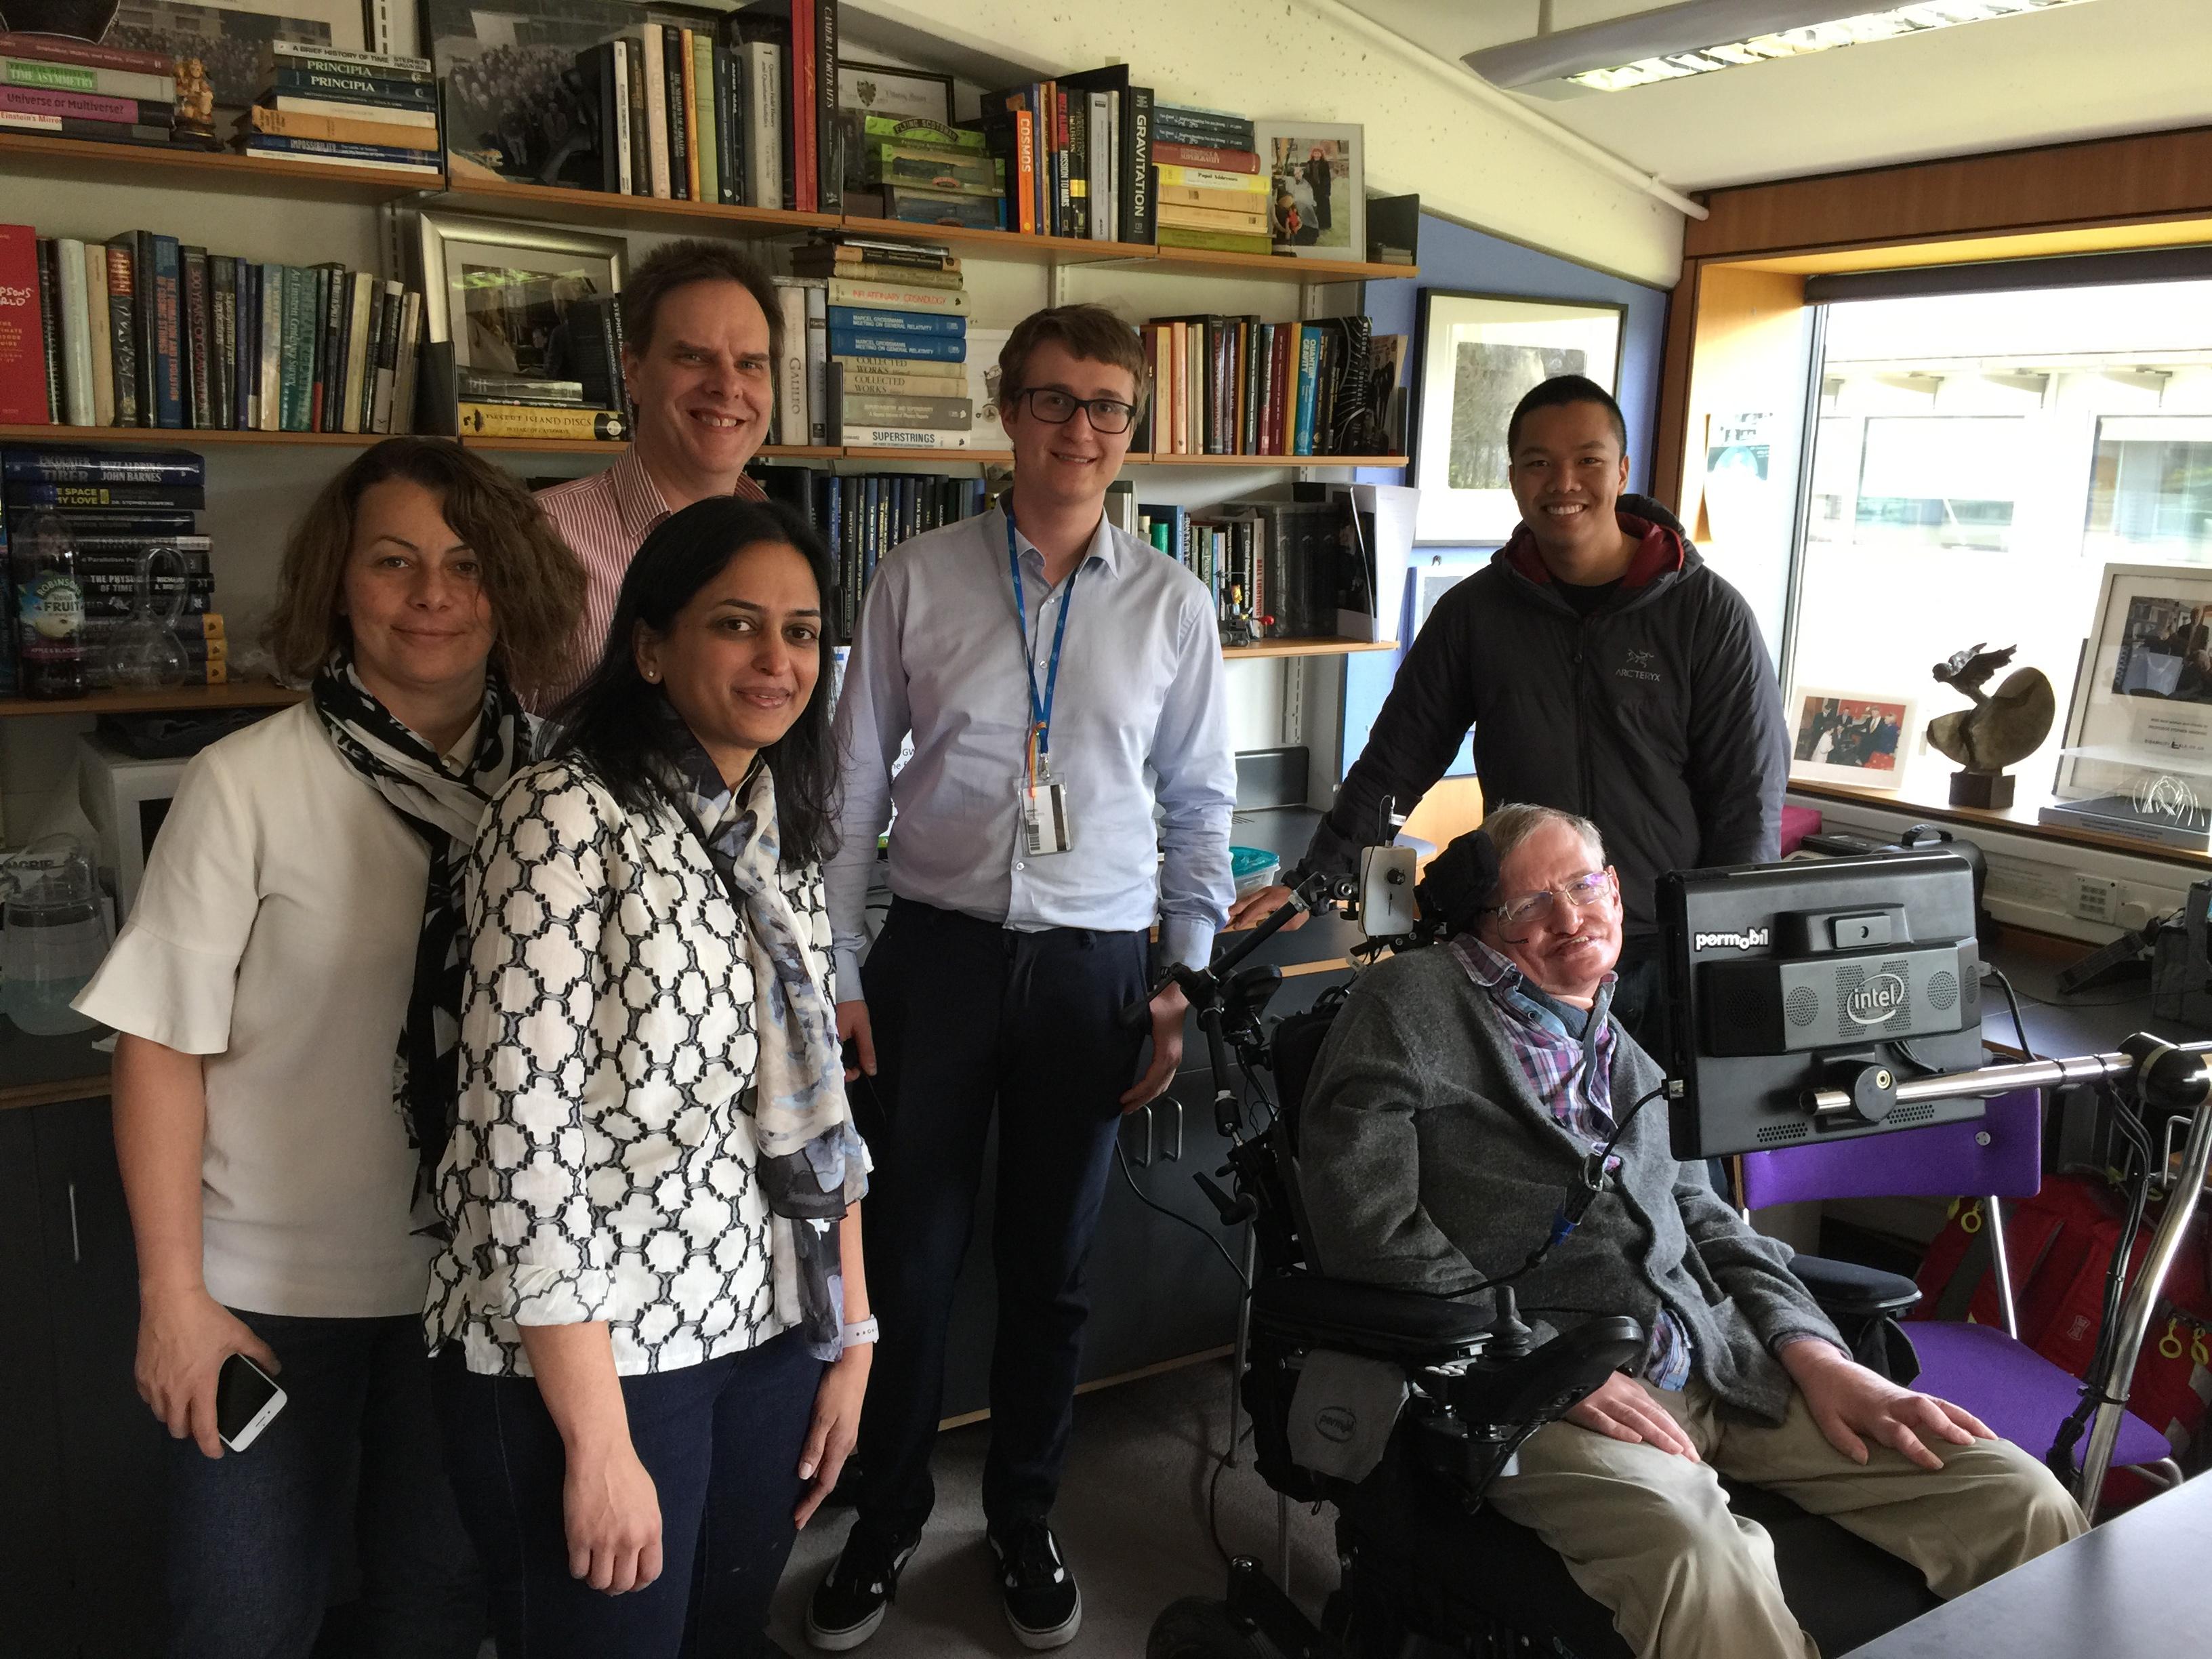 Stephen Hawking's Voice Emulator - Pawel Wozniak, Electronic